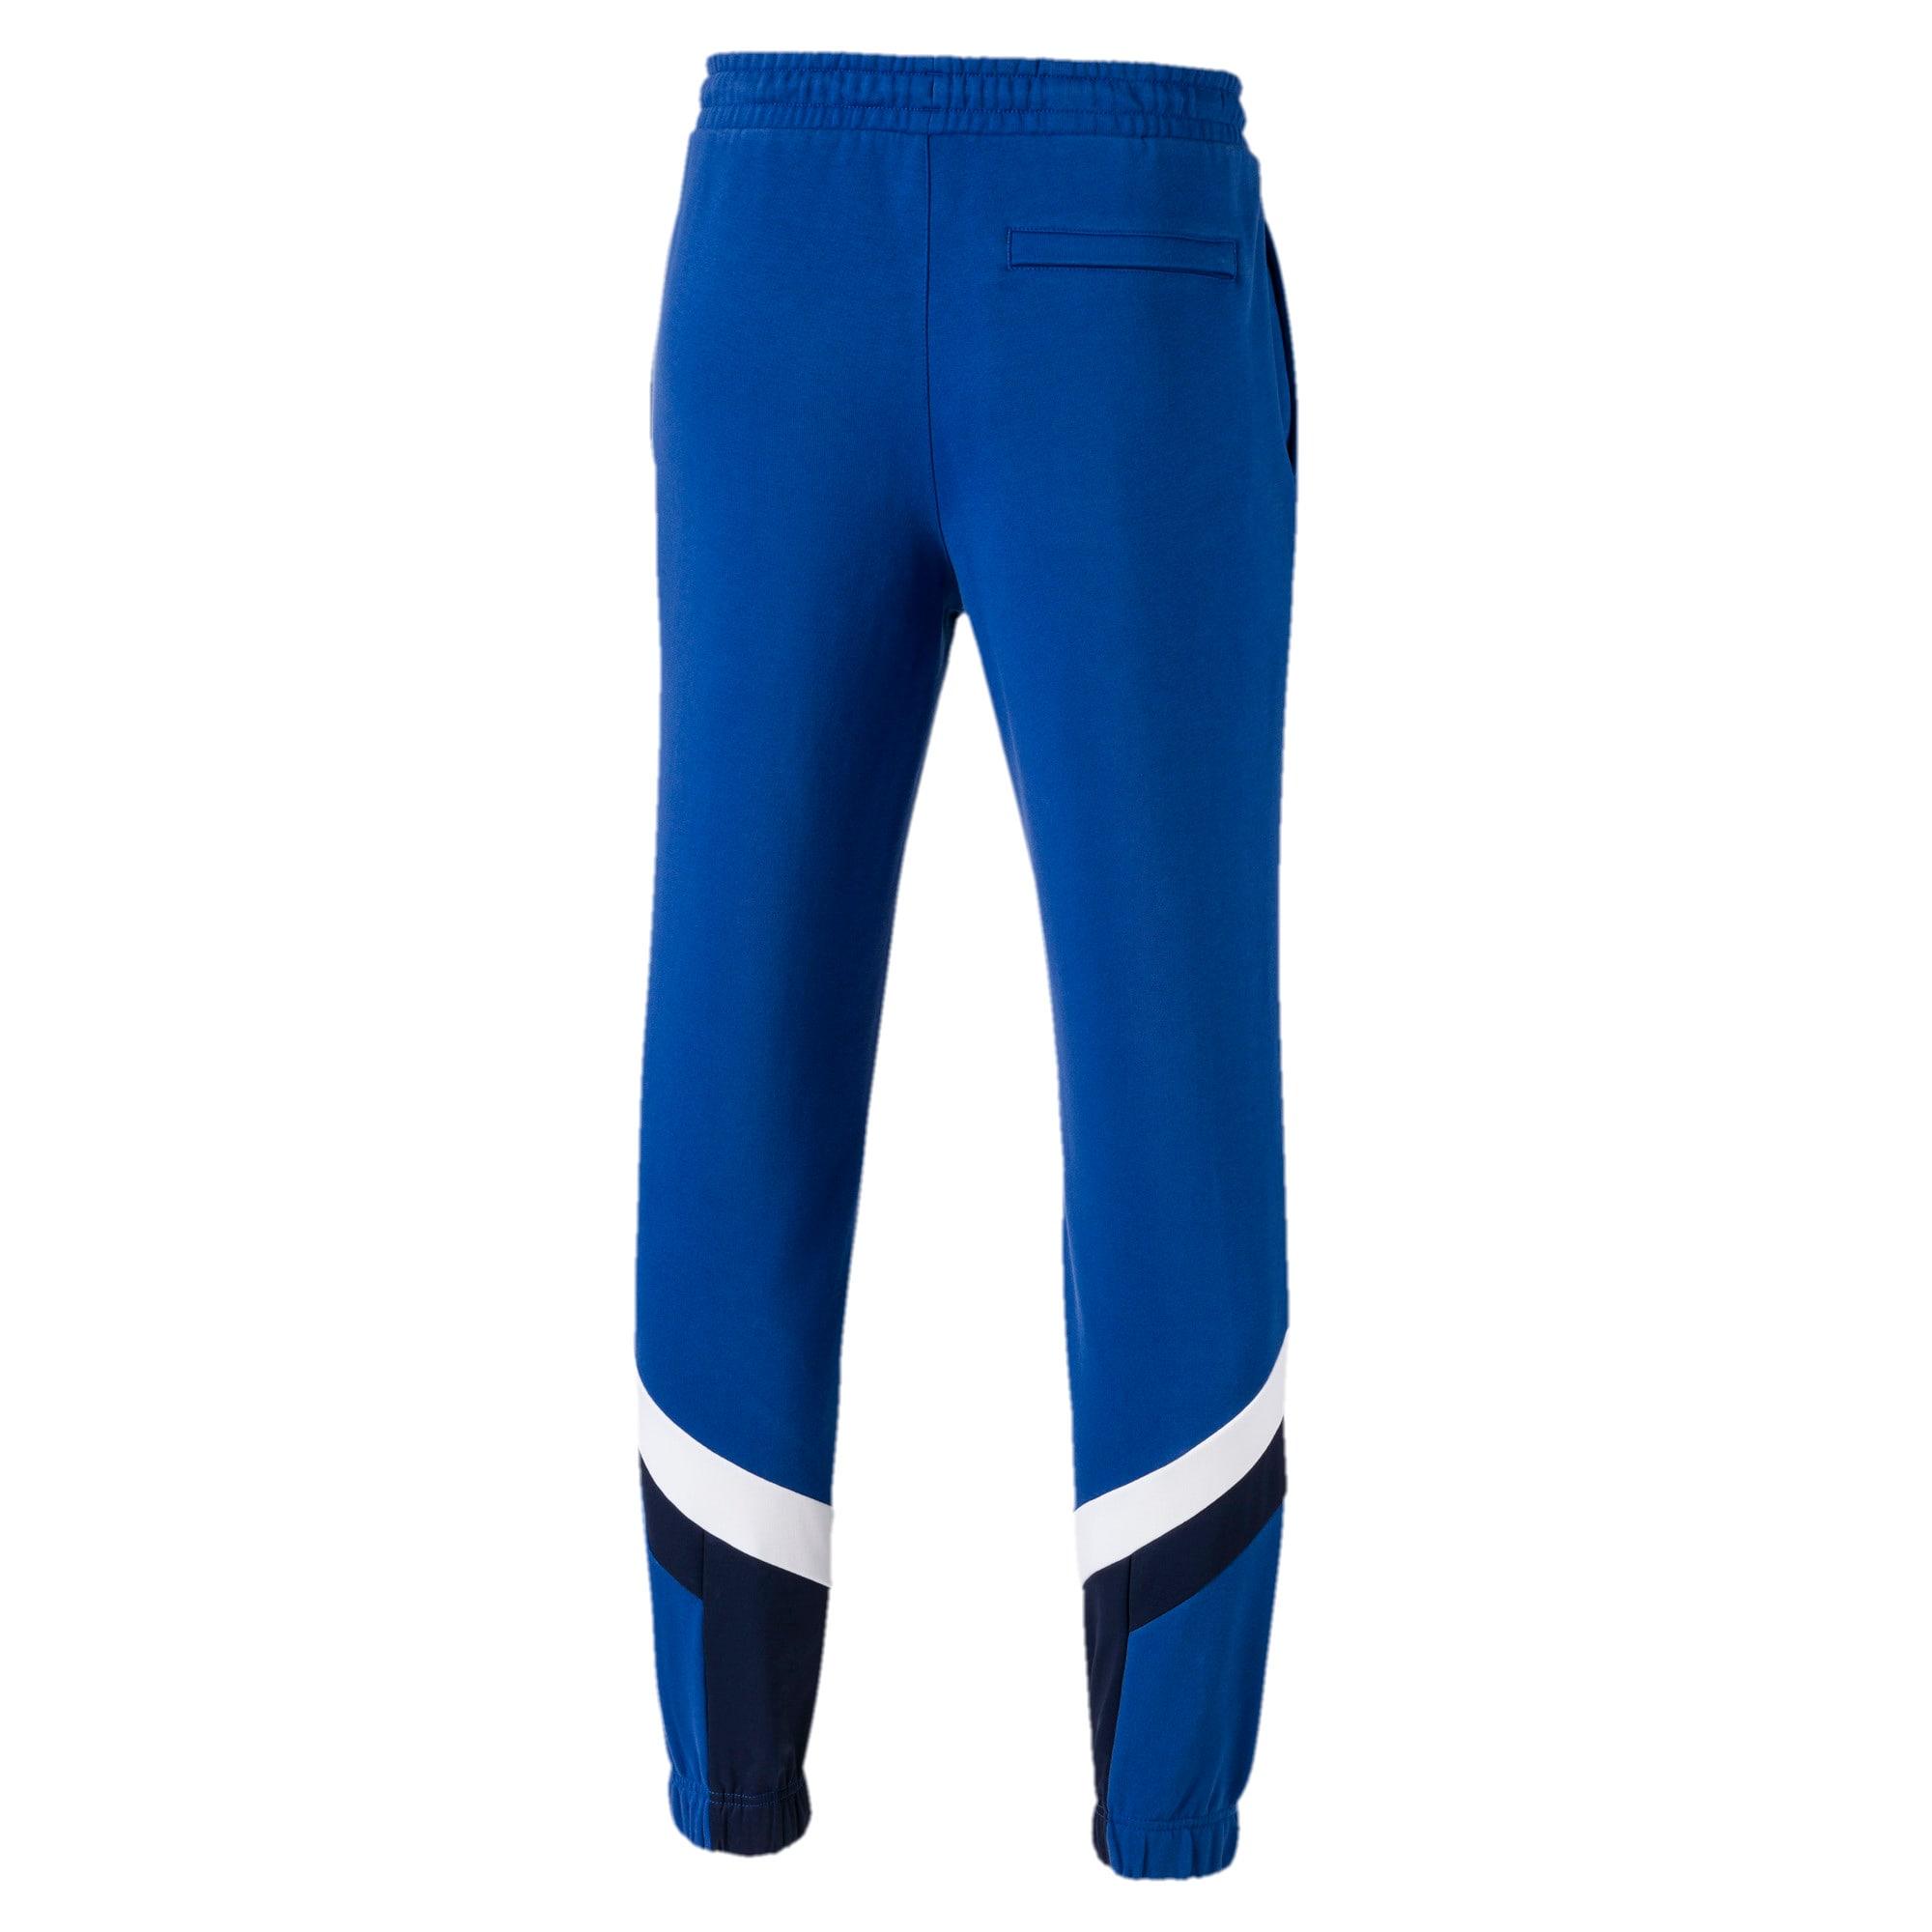 Thumbnail 5 of Iconic MCS Men's Track Pants, Galaxy Blue, medium